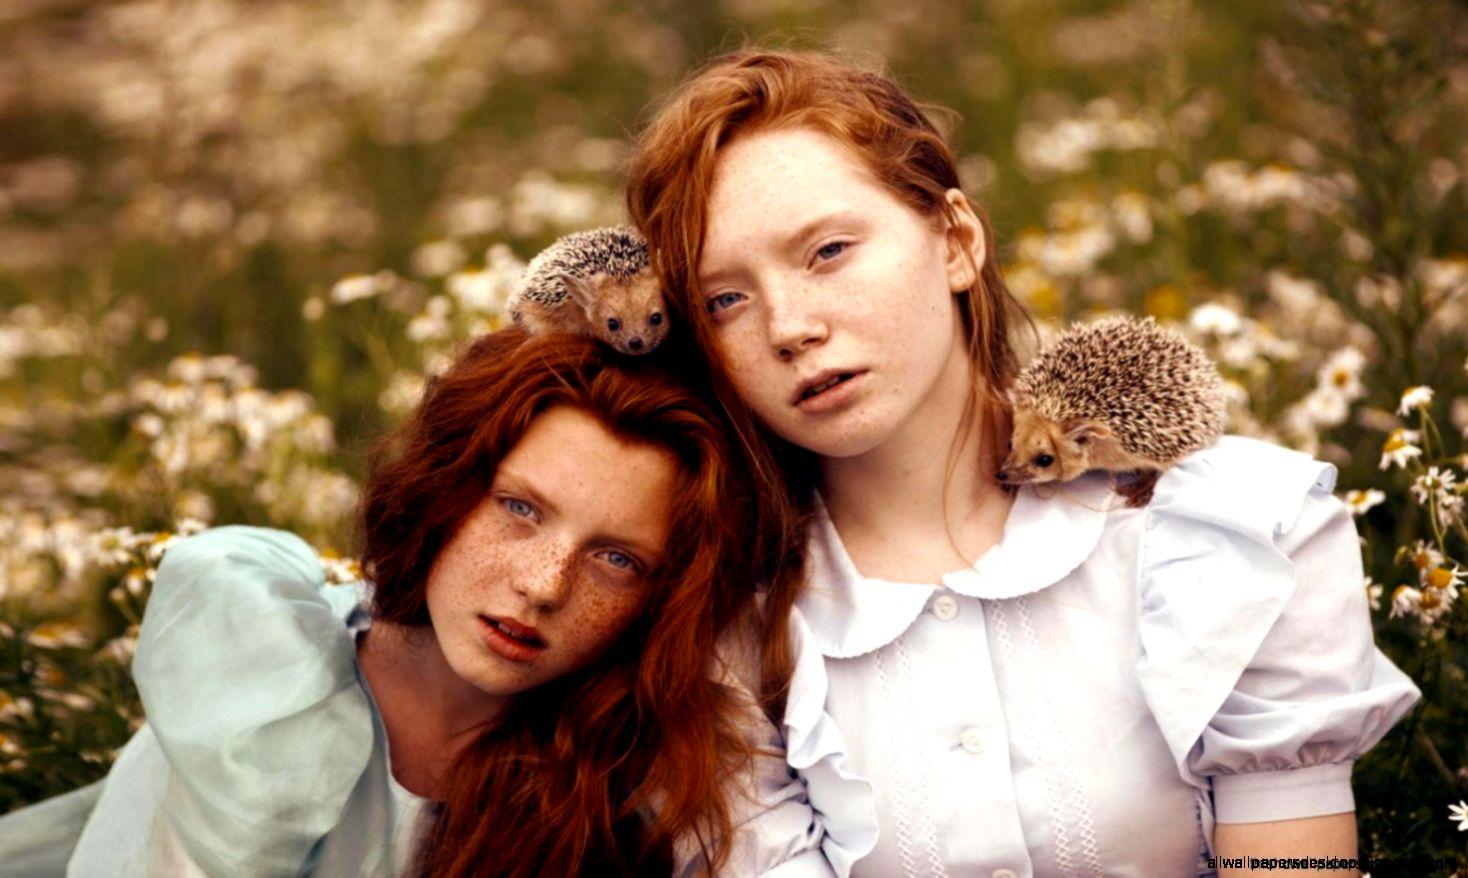 Redhead Girls Freckles Hedgehogs Mood Hd Wallpaper  HD Wallpapers